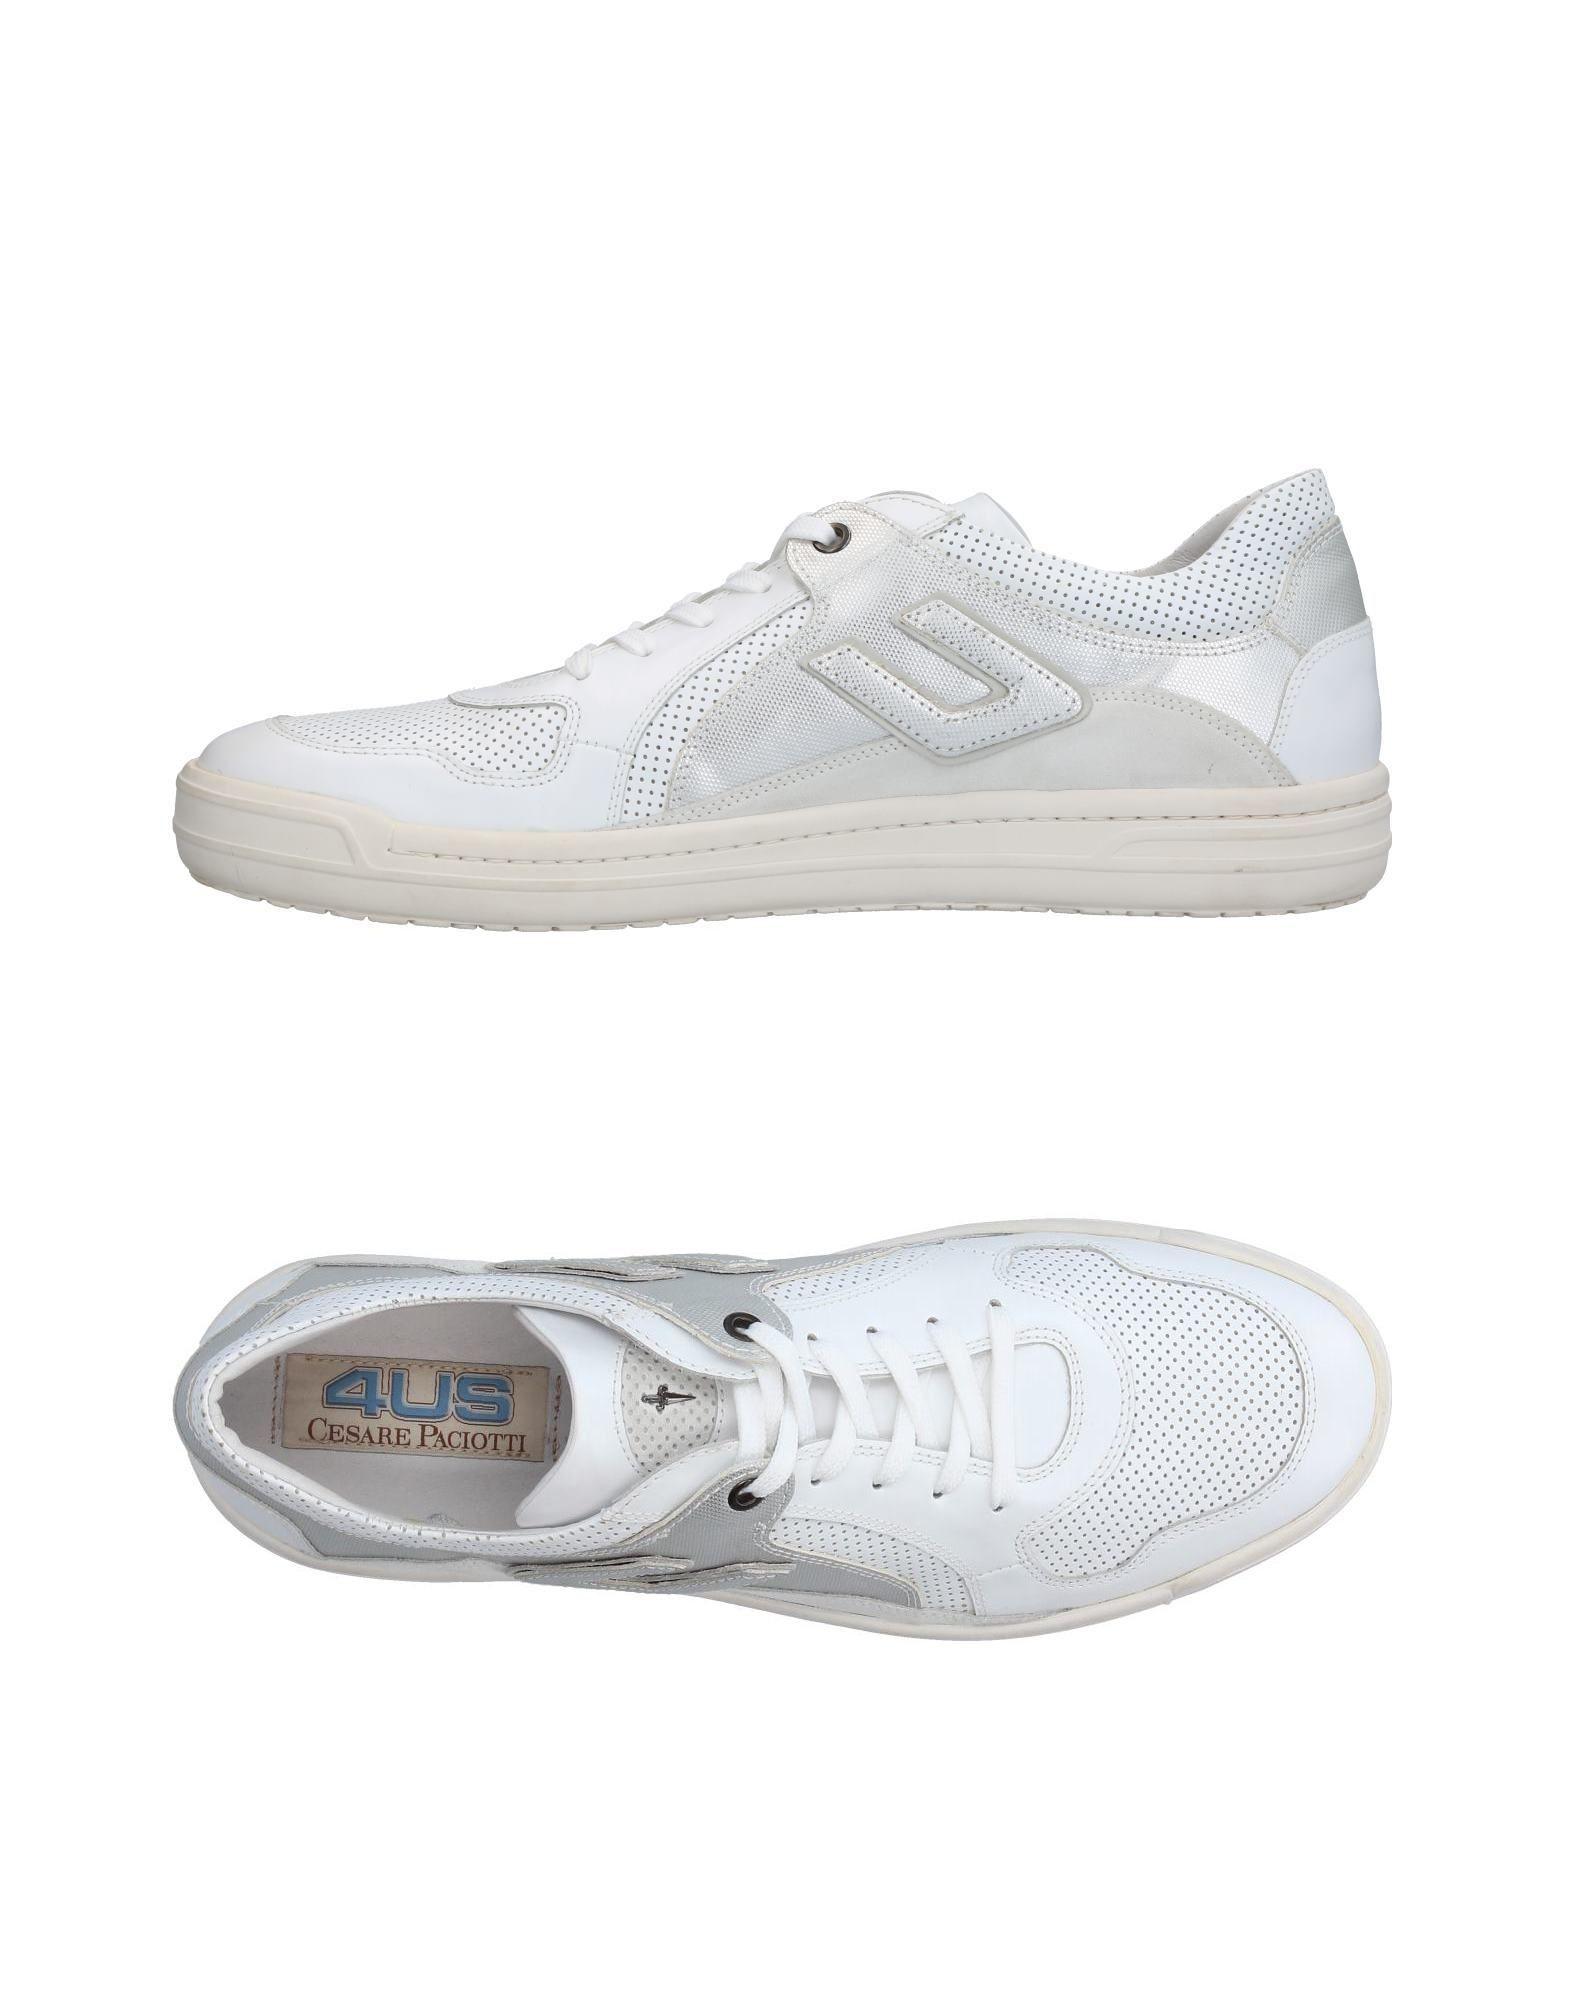 Sneakers Cesare Paciotti 4Us Uomo - Acquista online su